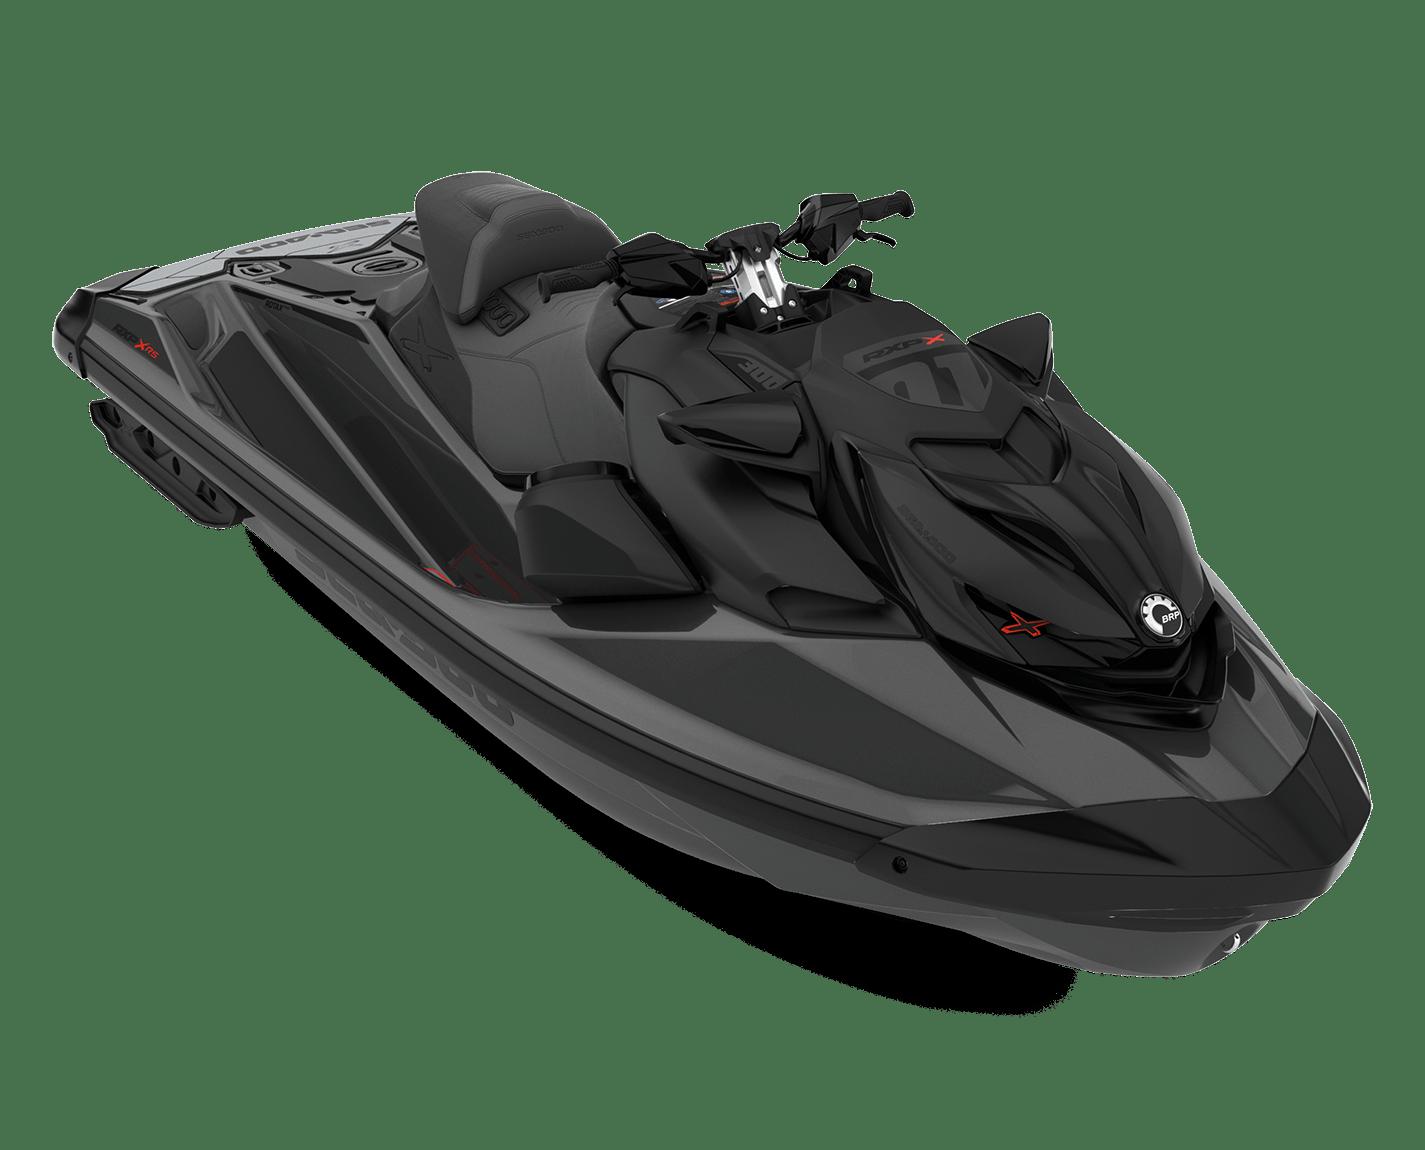 RXP-X 300 product image 2